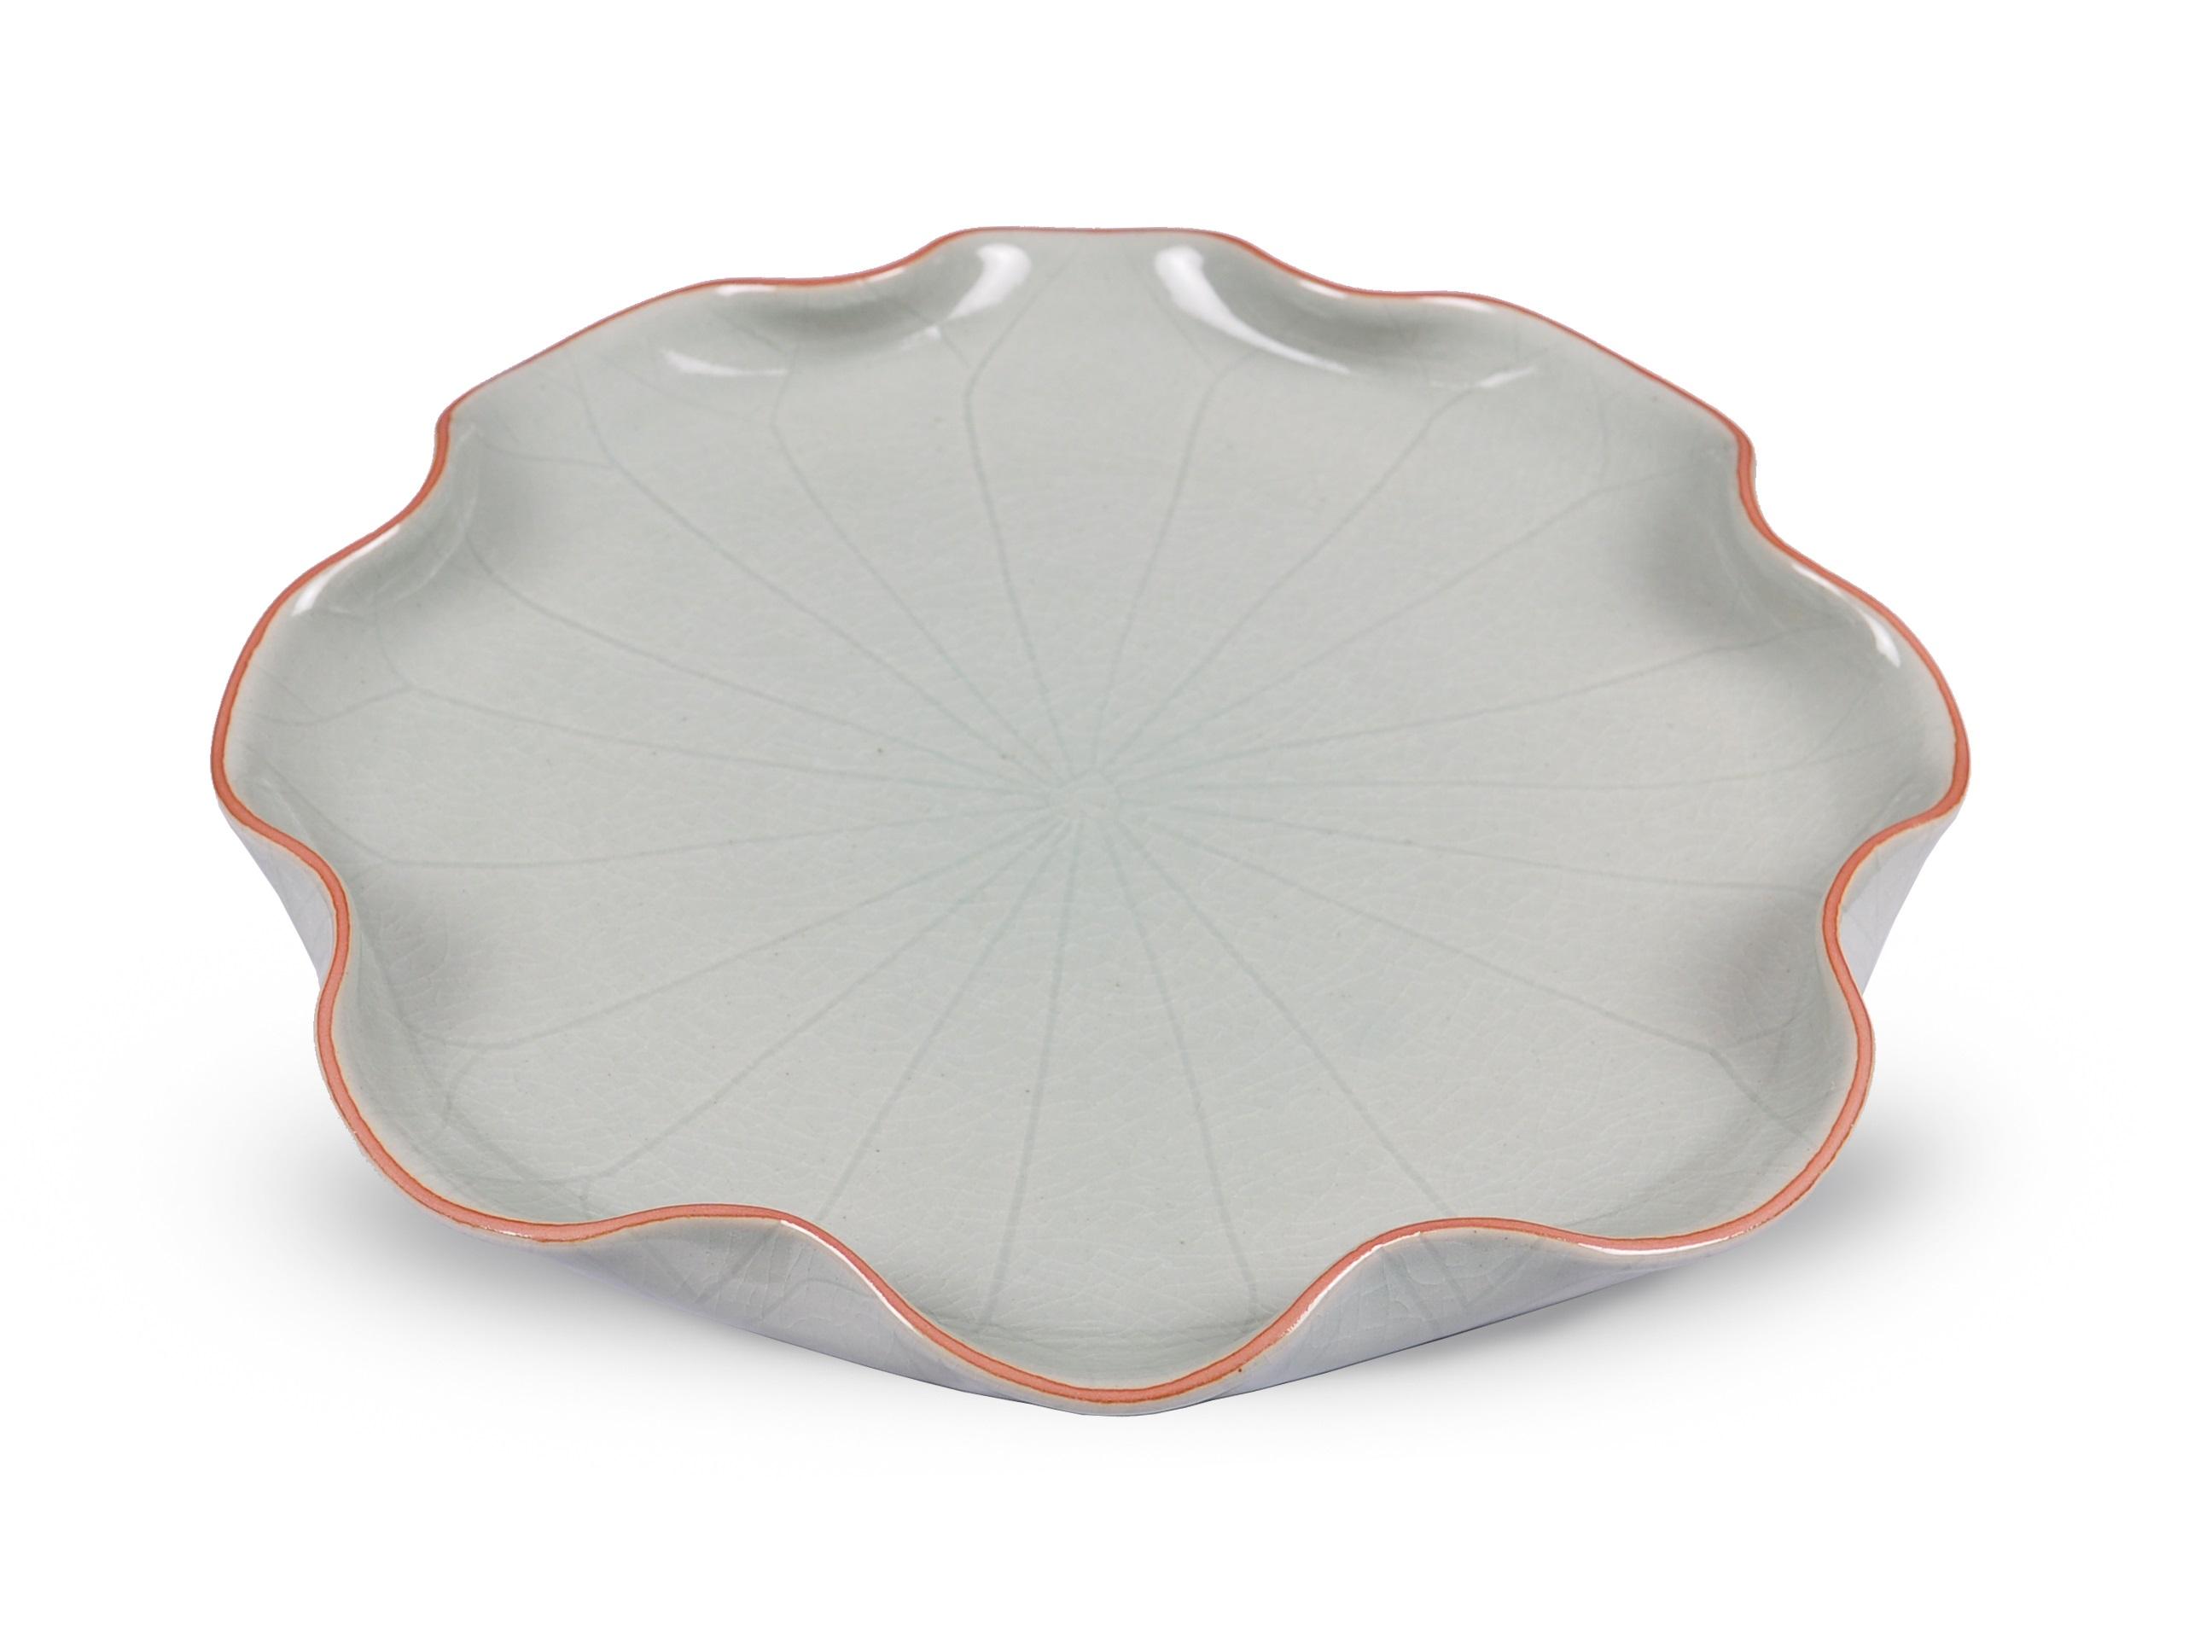 Тарелка в виде листа лотоса LotusДекоративные блюда<br>Материал: габардин.<br><br>Material: Керамика<br>Height см: 3<br>Diameter см: 31.5